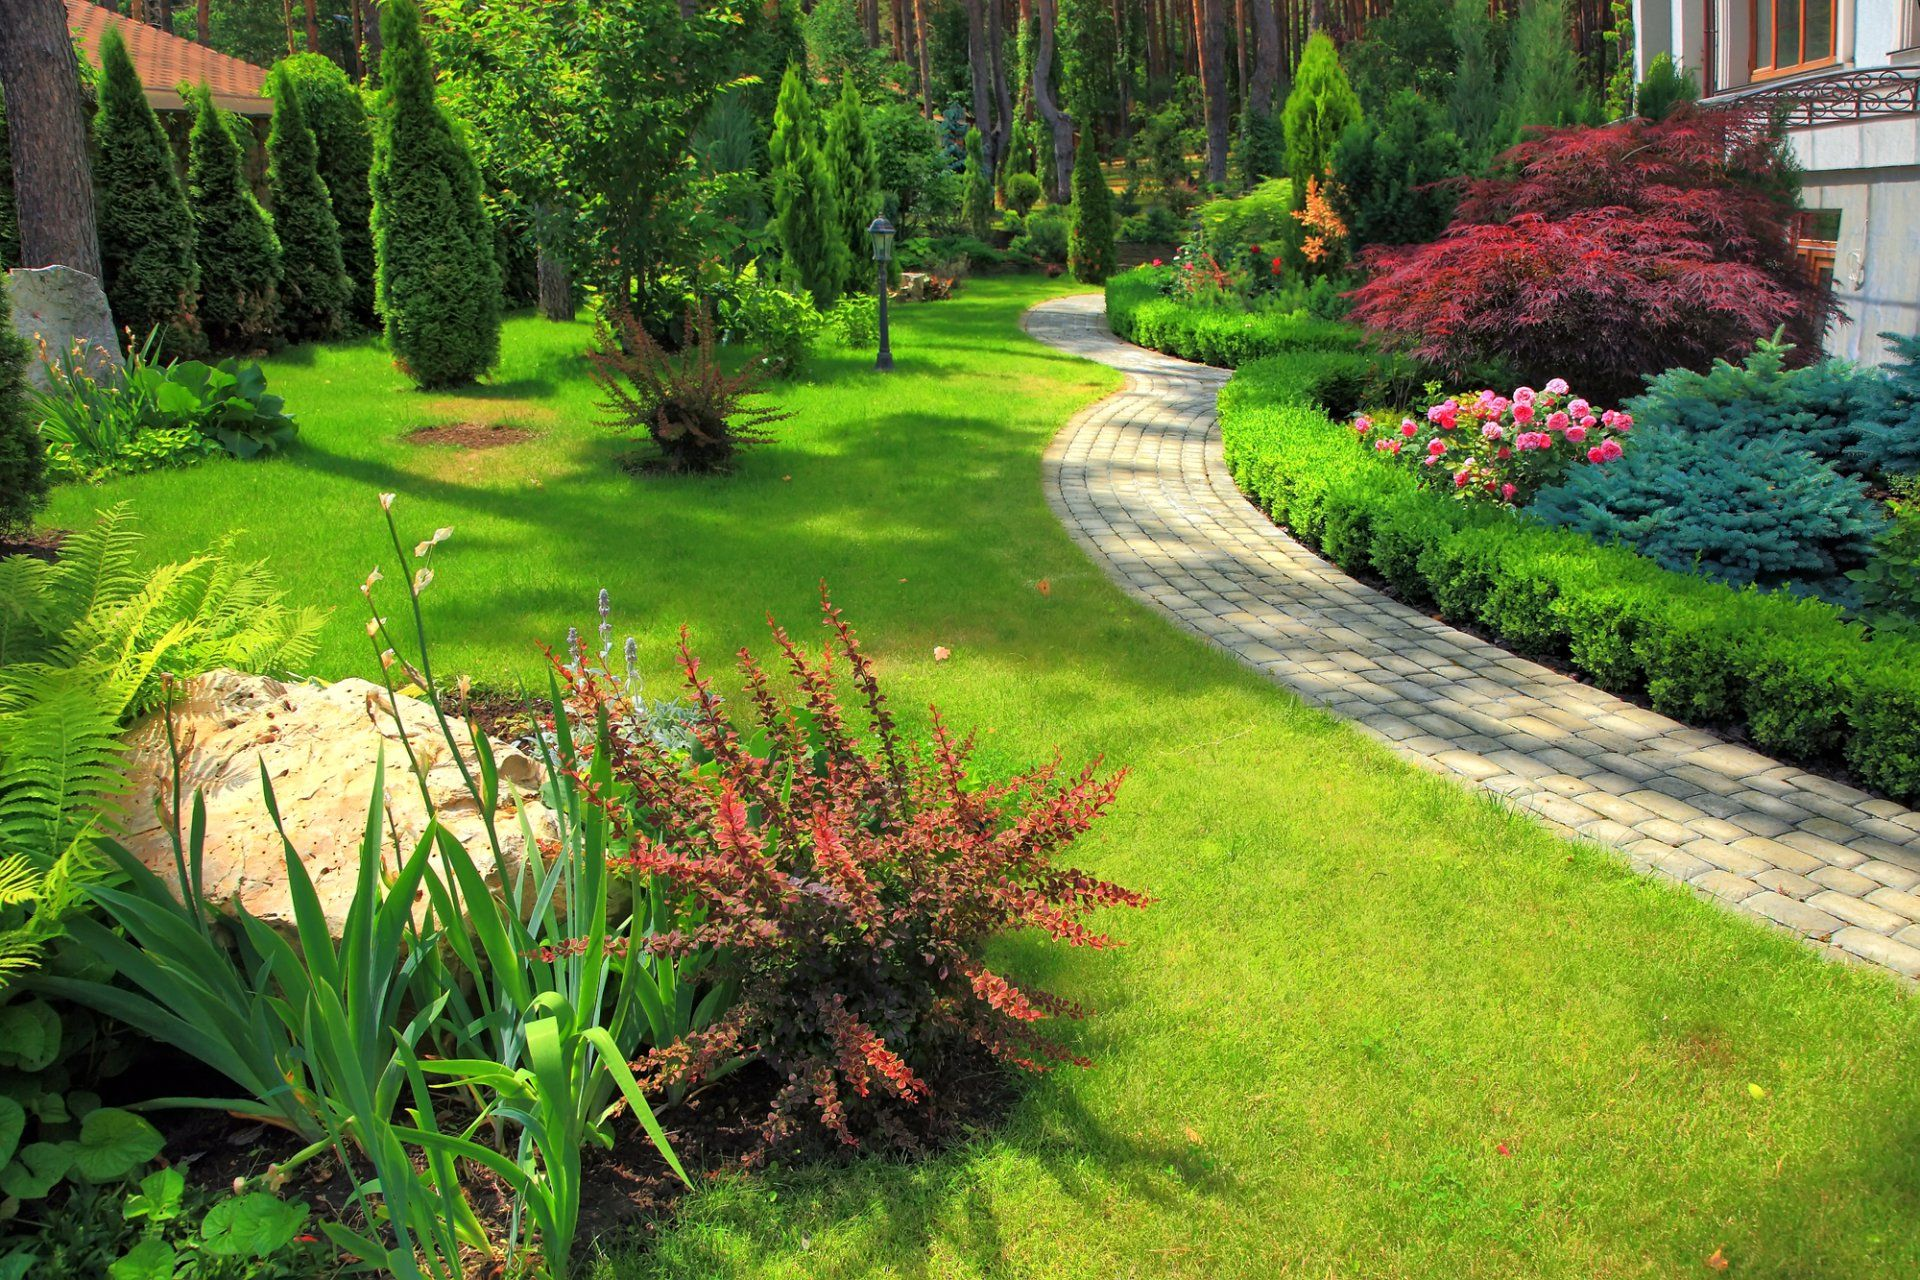 Landscaper In Sanford Nc Sweet Leaf Lawn Care